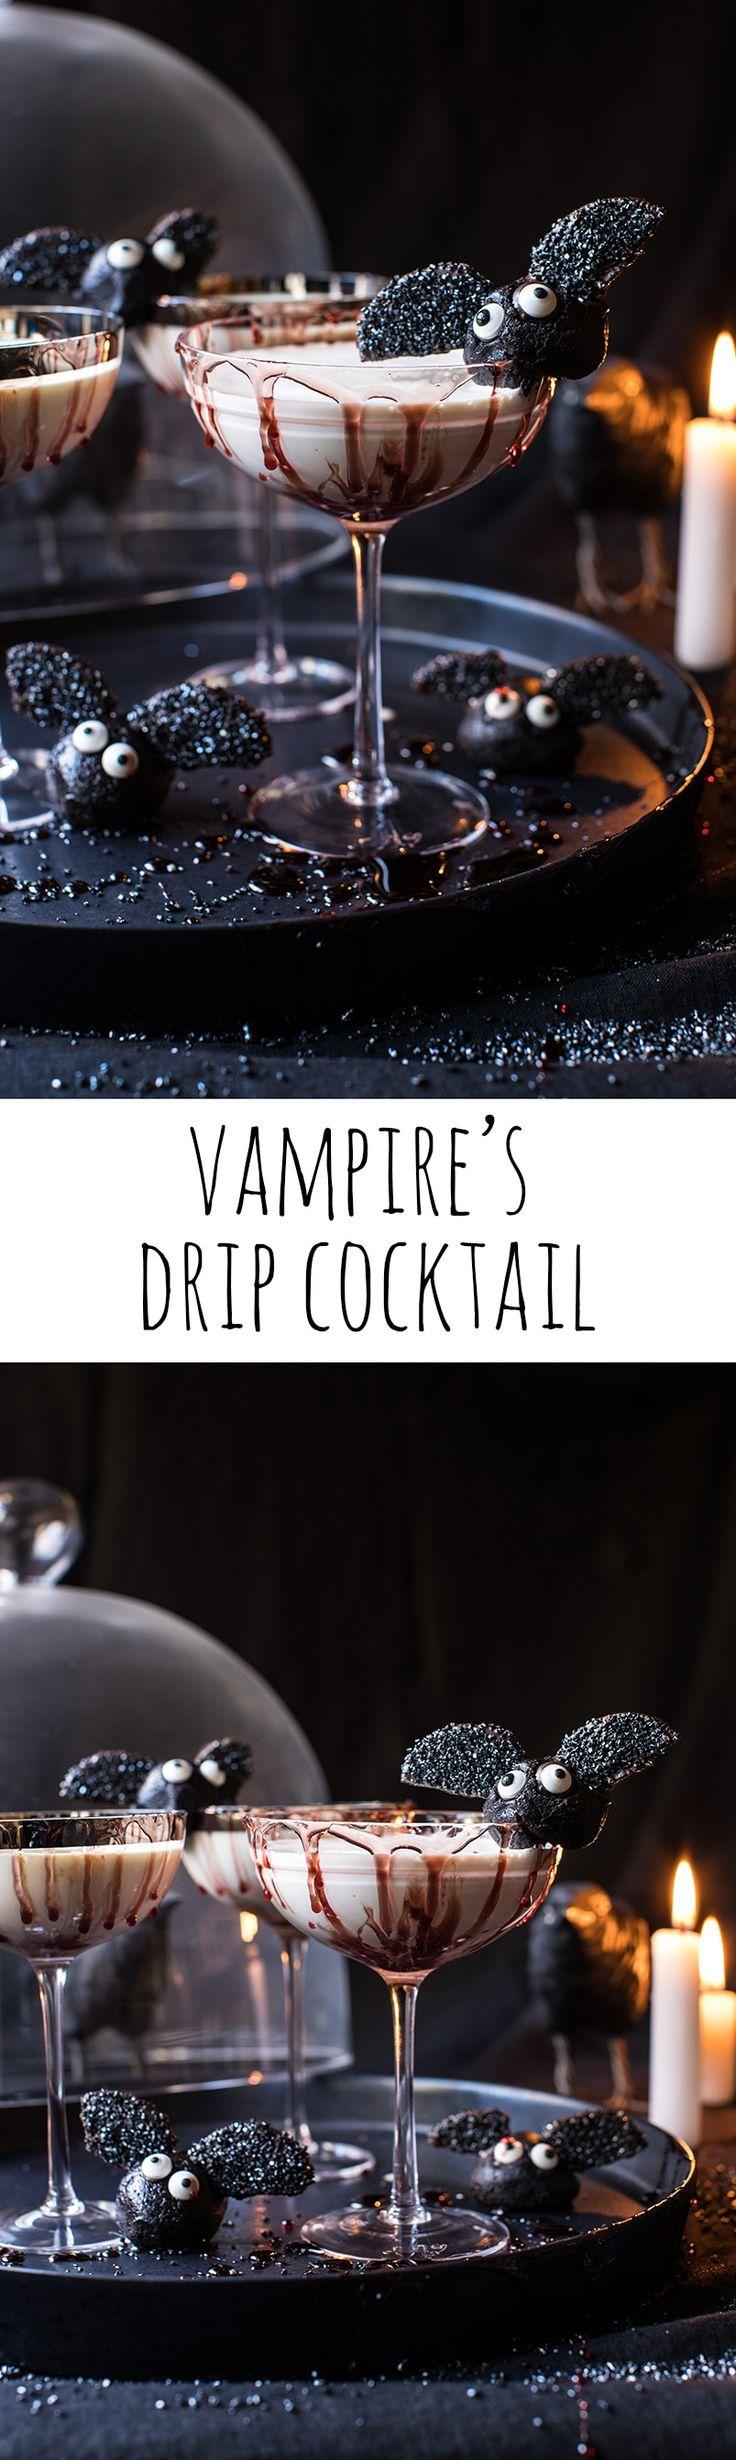 Vampire's Drip Cocktail | halfbakedharvest.com @hbharvest